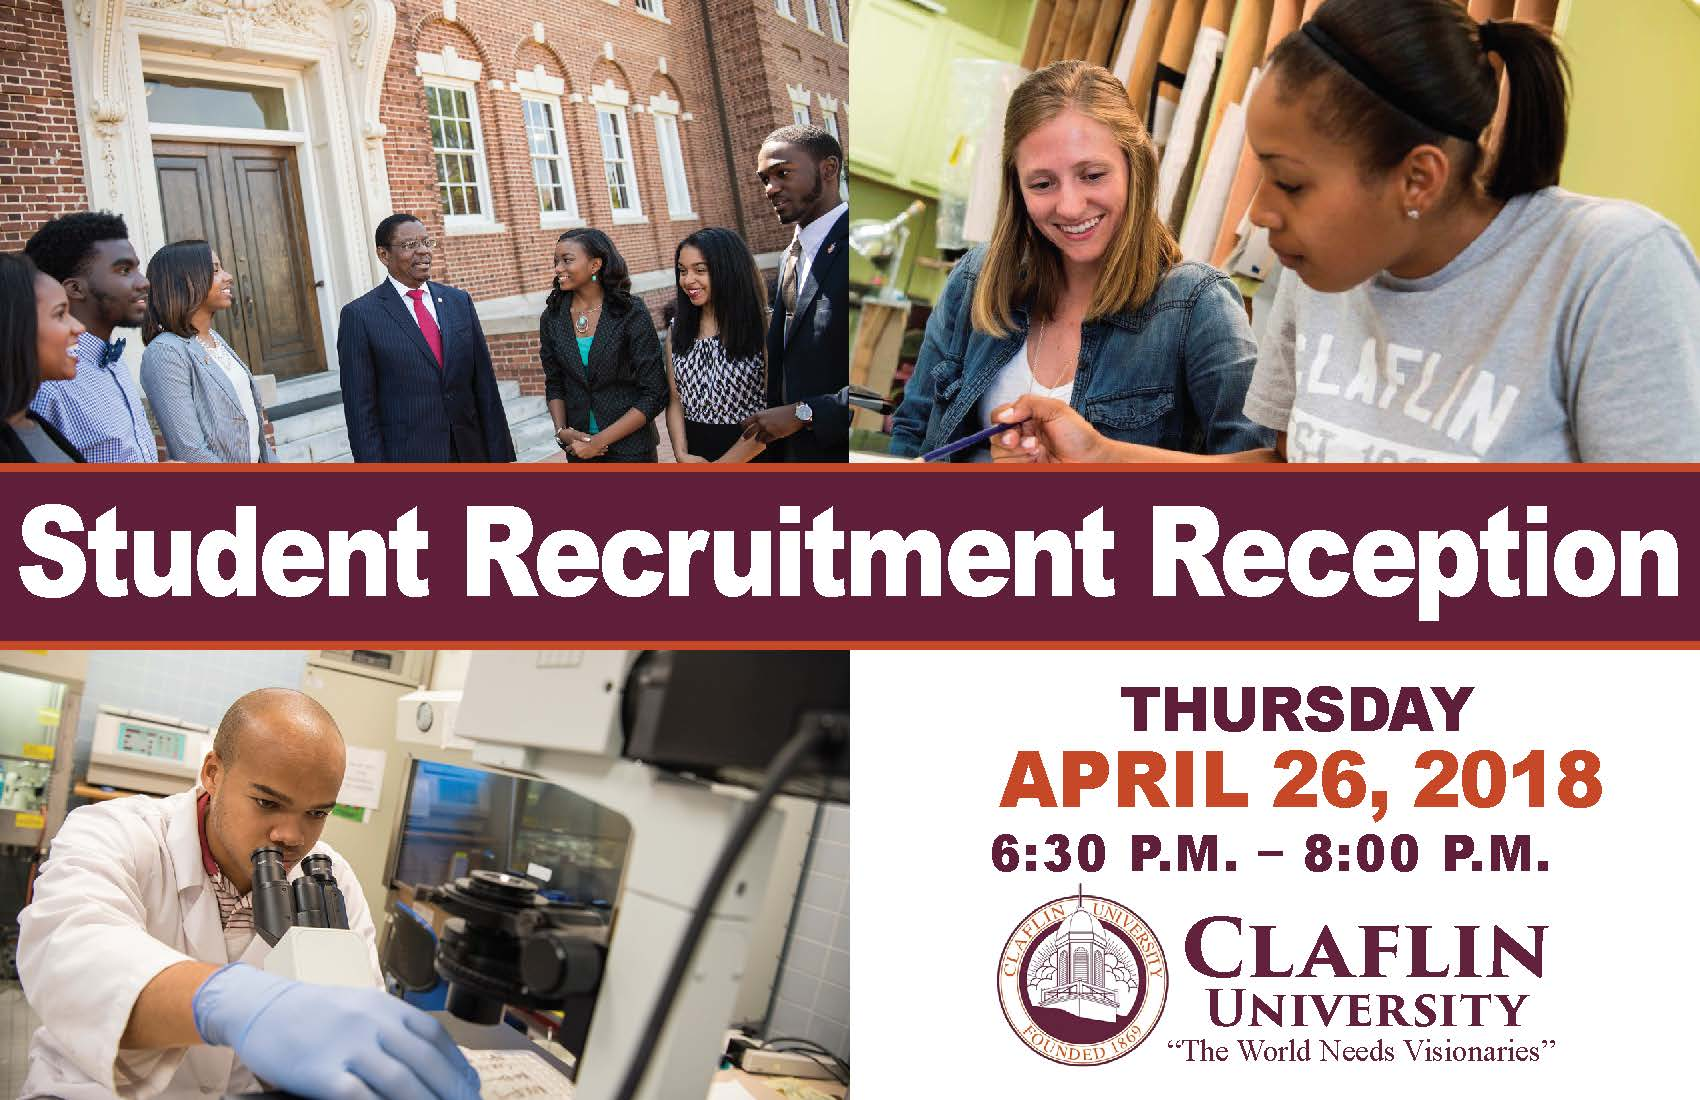 Student Recruitment Reception - April 26 2018 - Mount Moriah (2)_Page_1